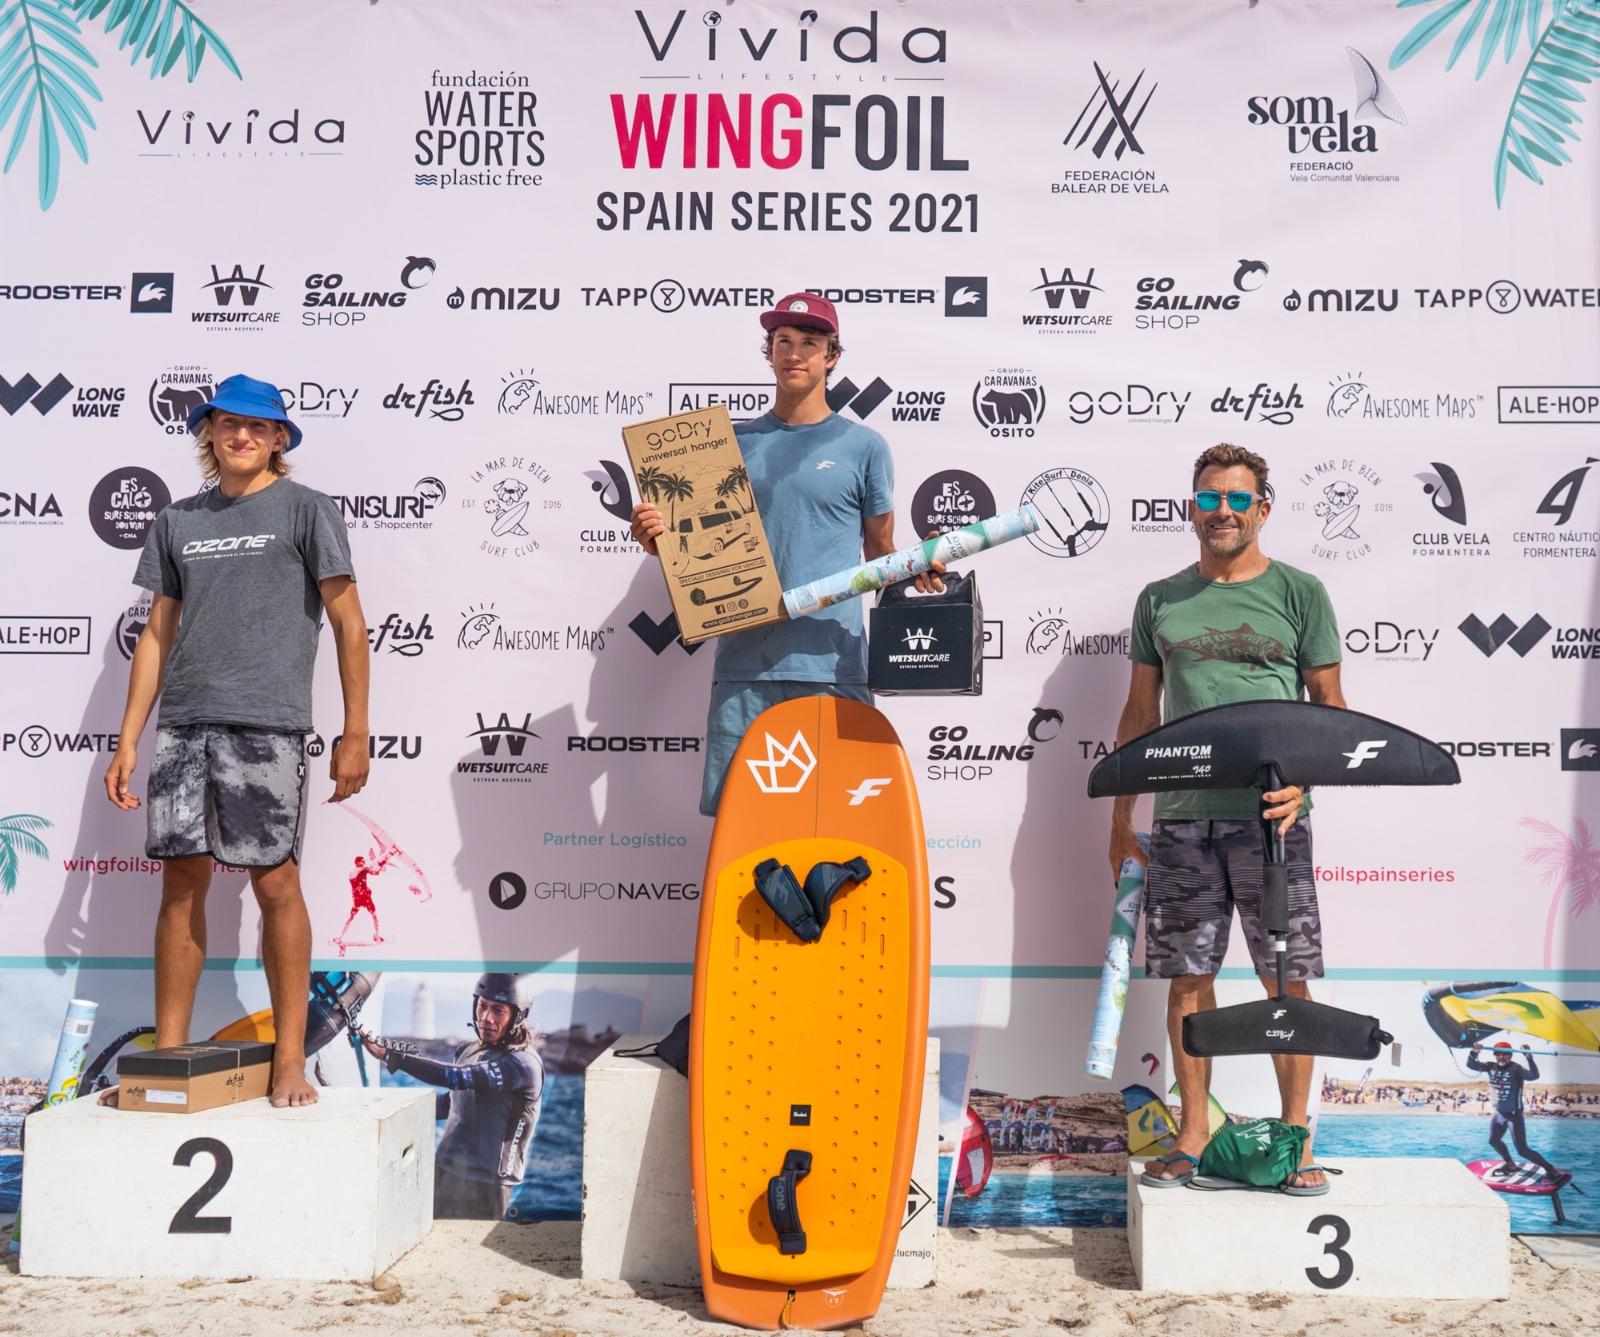 Ducos, primer vencedor del Vivida Wing Foil Spain Series